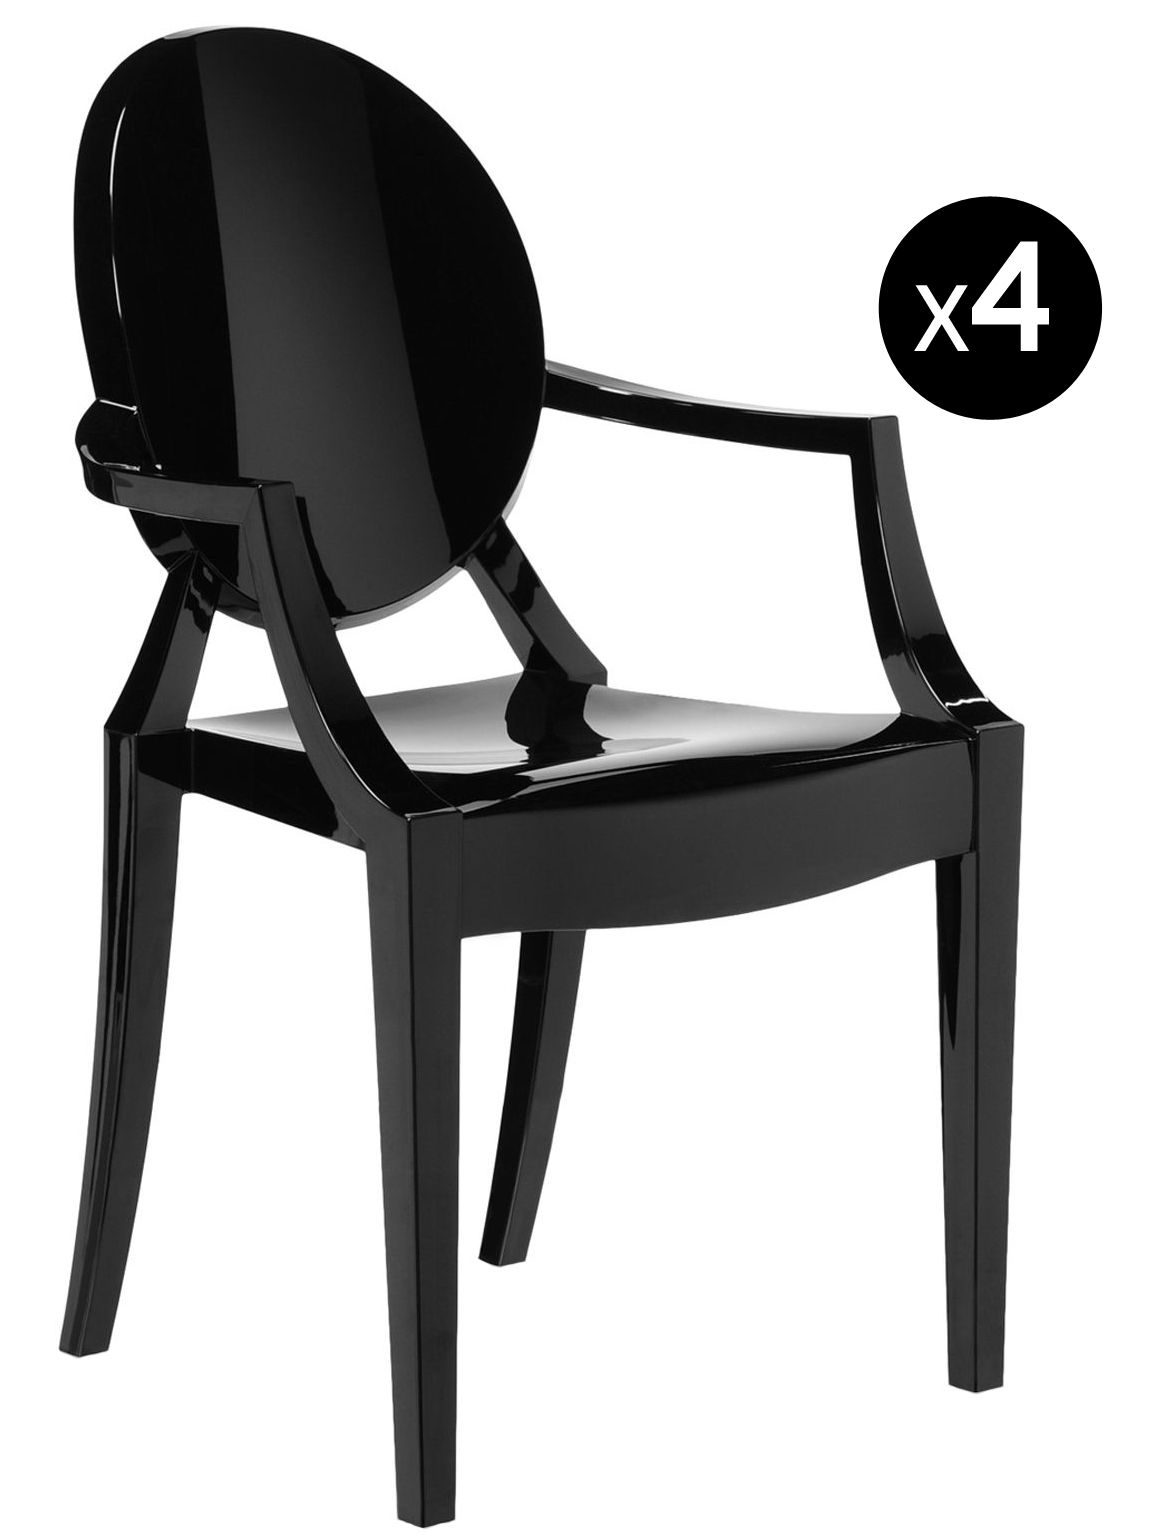 Möbel - Stühle  - Louis Ghost Stapelbarer Sessel Opak-Ausführung - Set mit 4 Stühlen - Kartell - Opakschwarz - Polykarbonat